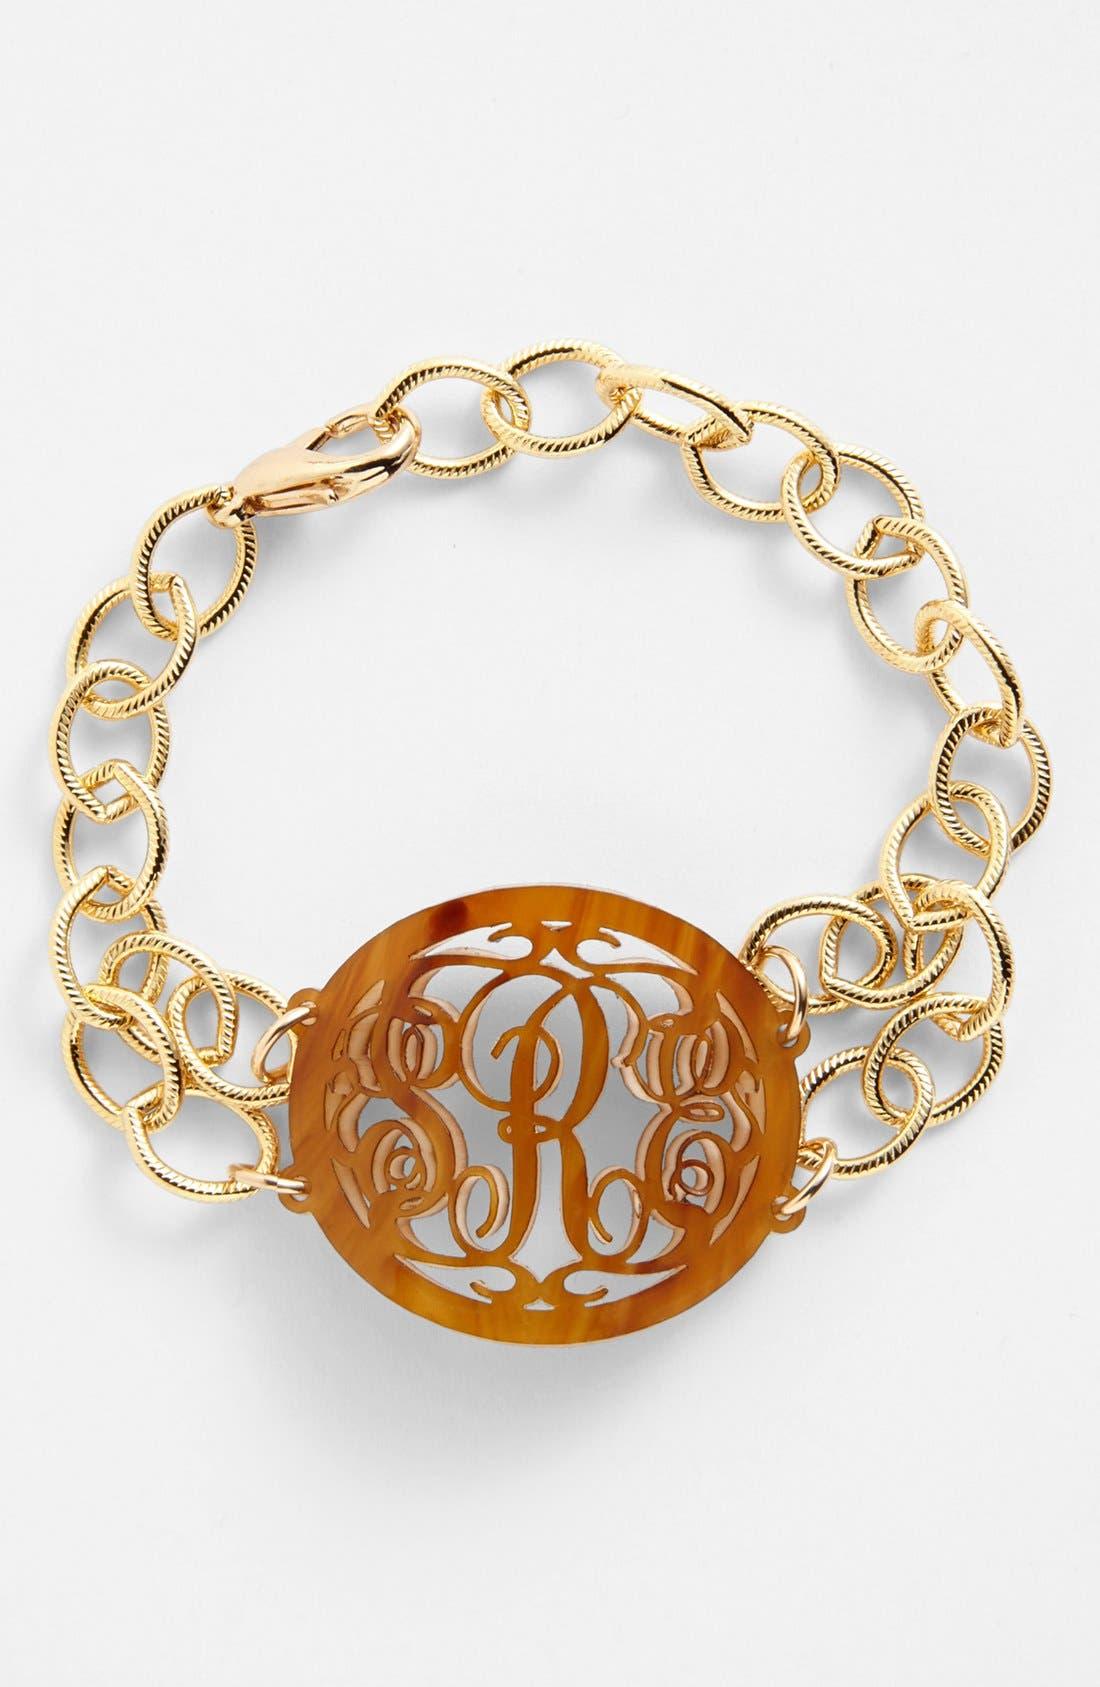 'Annabel' Medium Oval Personalized Monogram Bracelet,                         Main,                         color, Tigers Eye/ Gold